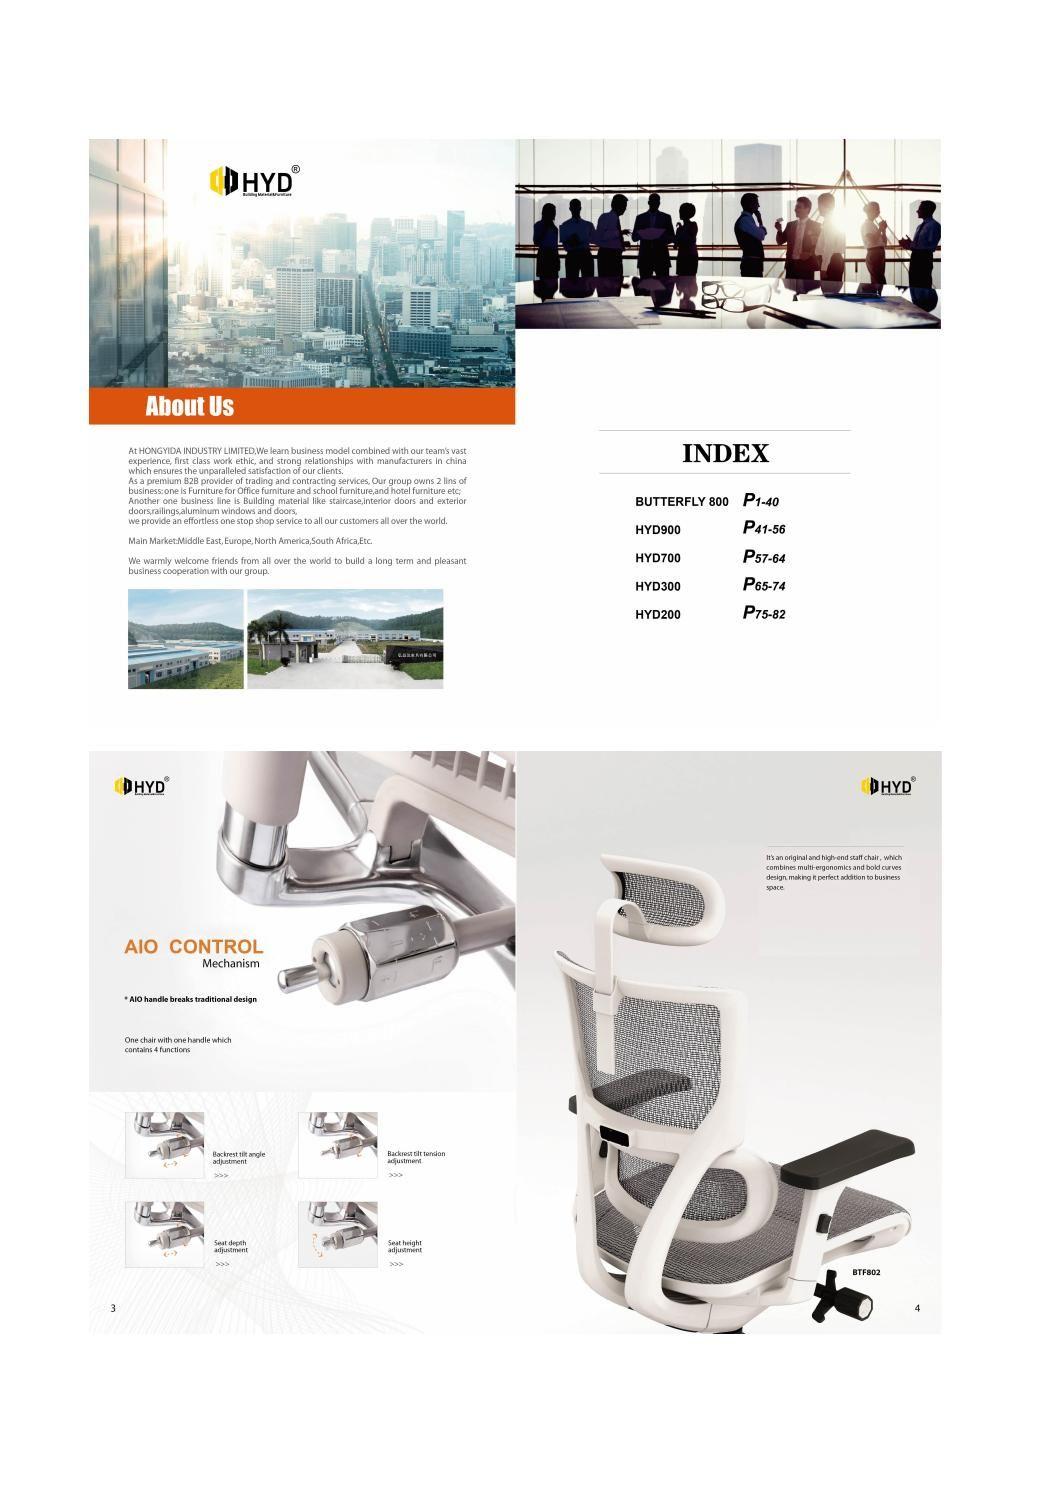 Catalog of ergonomic chair in hyd ergonomic chair beach